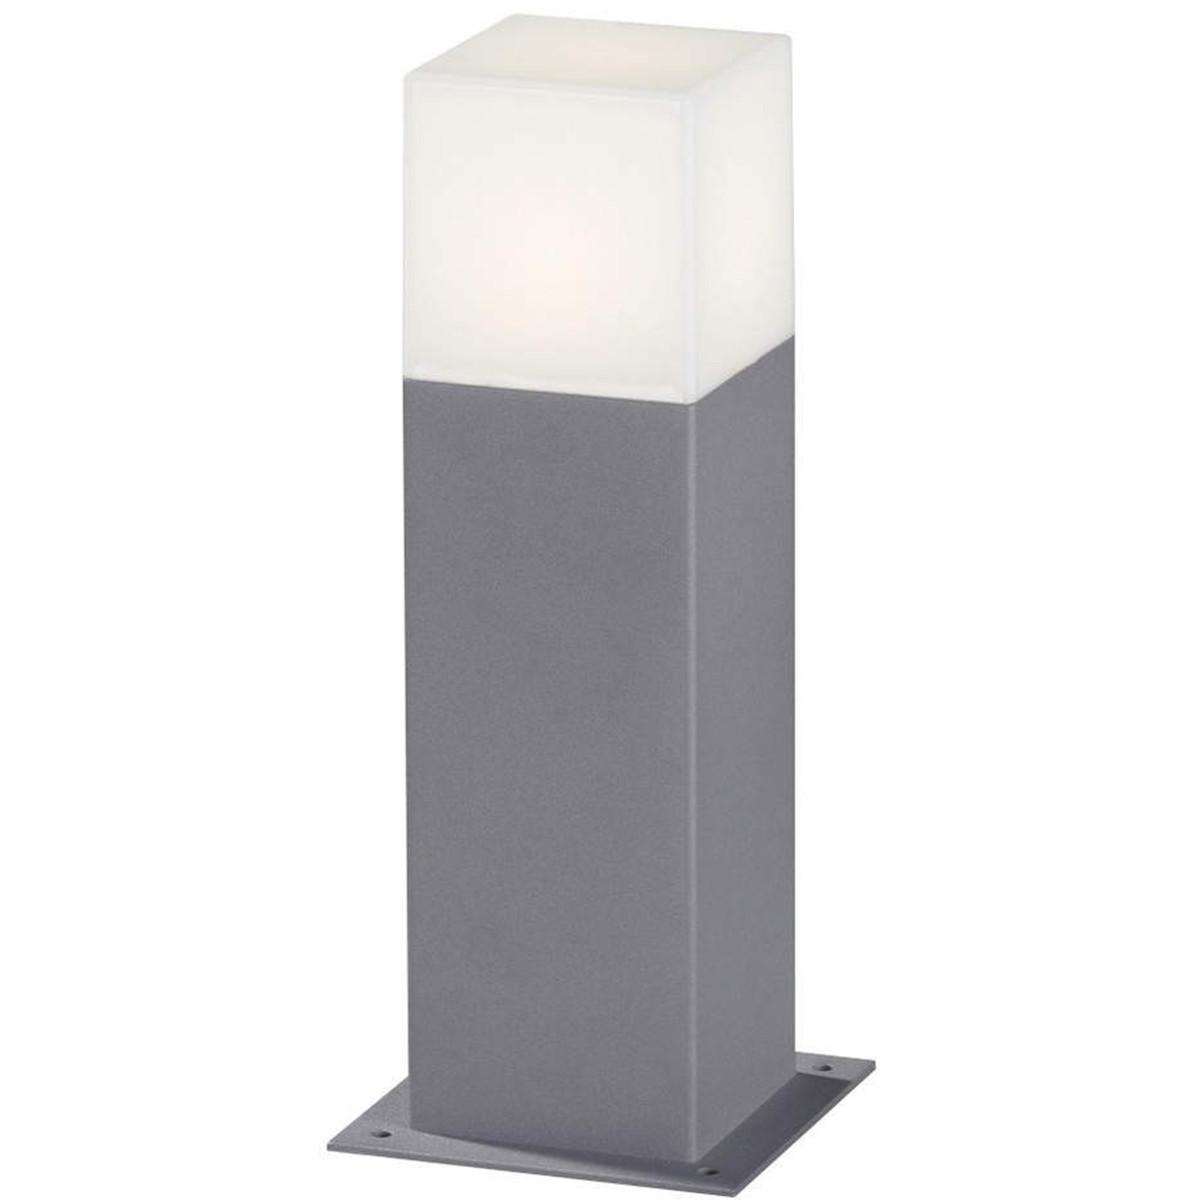 LED Tuinverlichting - Buitenlamp - Trion Hudsy - Staand - 4W - Mat Titaan - Aluminium